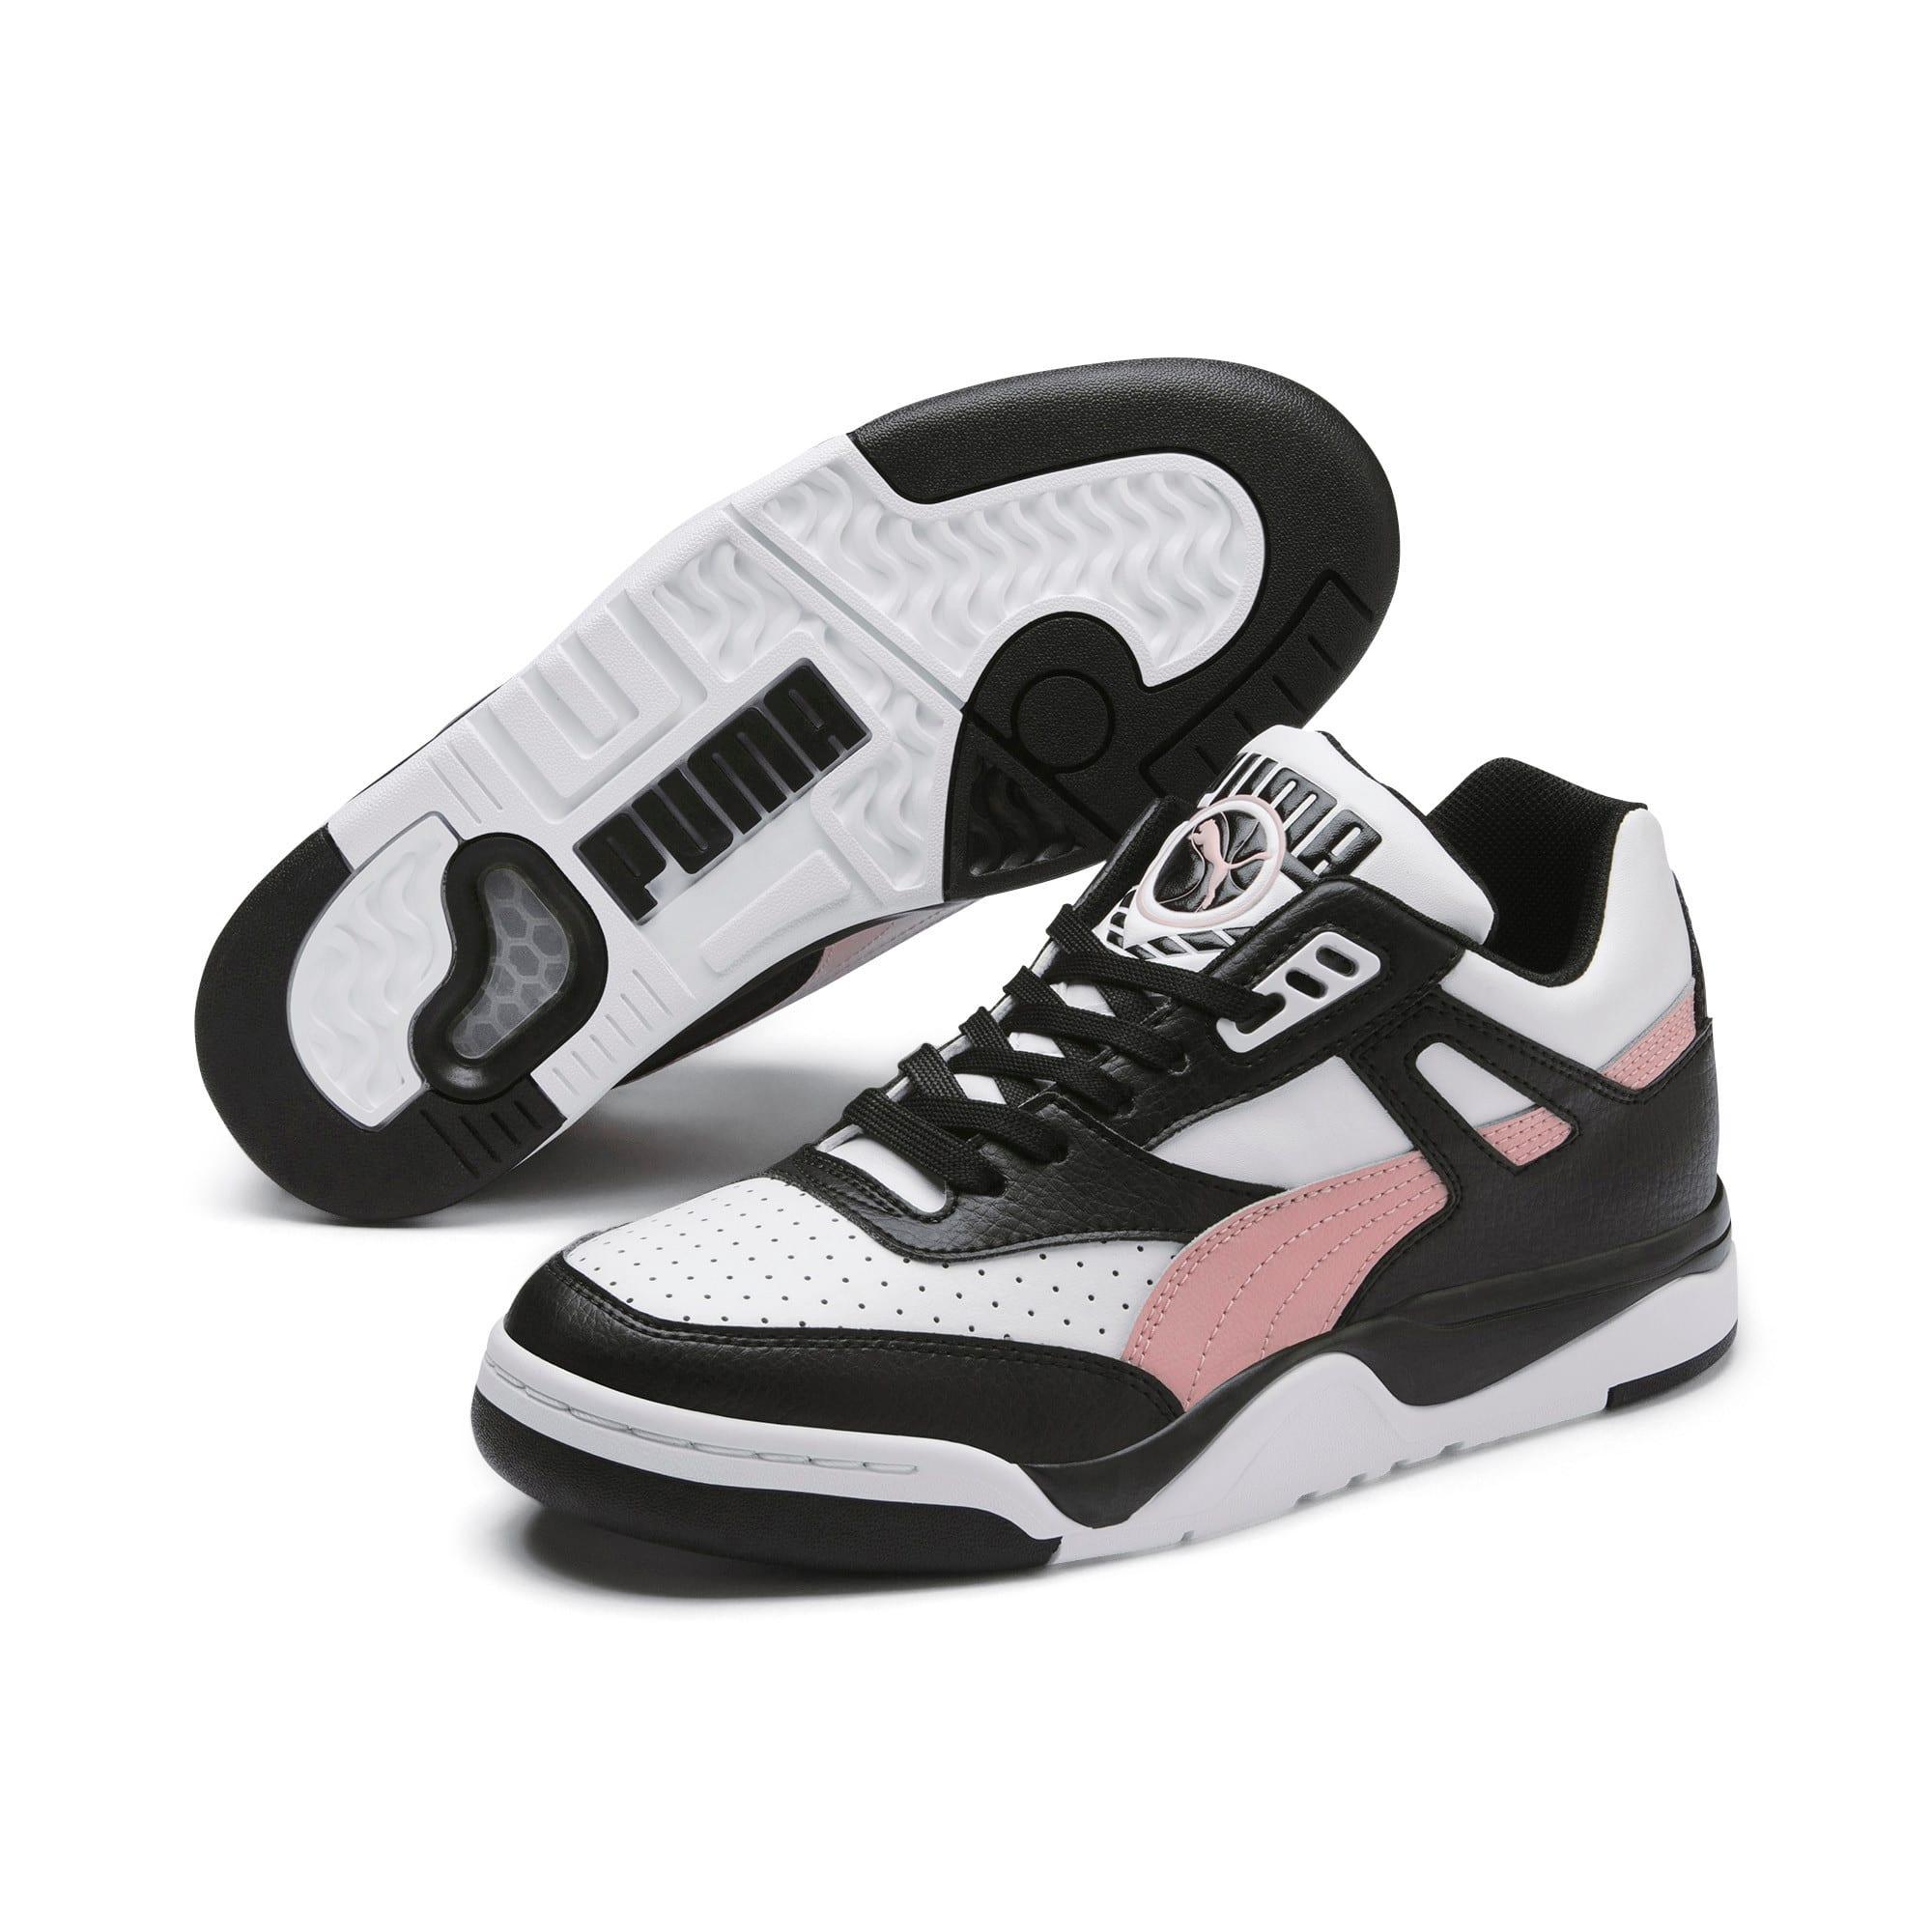 Thumbnail 3 of Palace Guard Colorblock Women's Sneakers, Puma Black-Puma White, medium